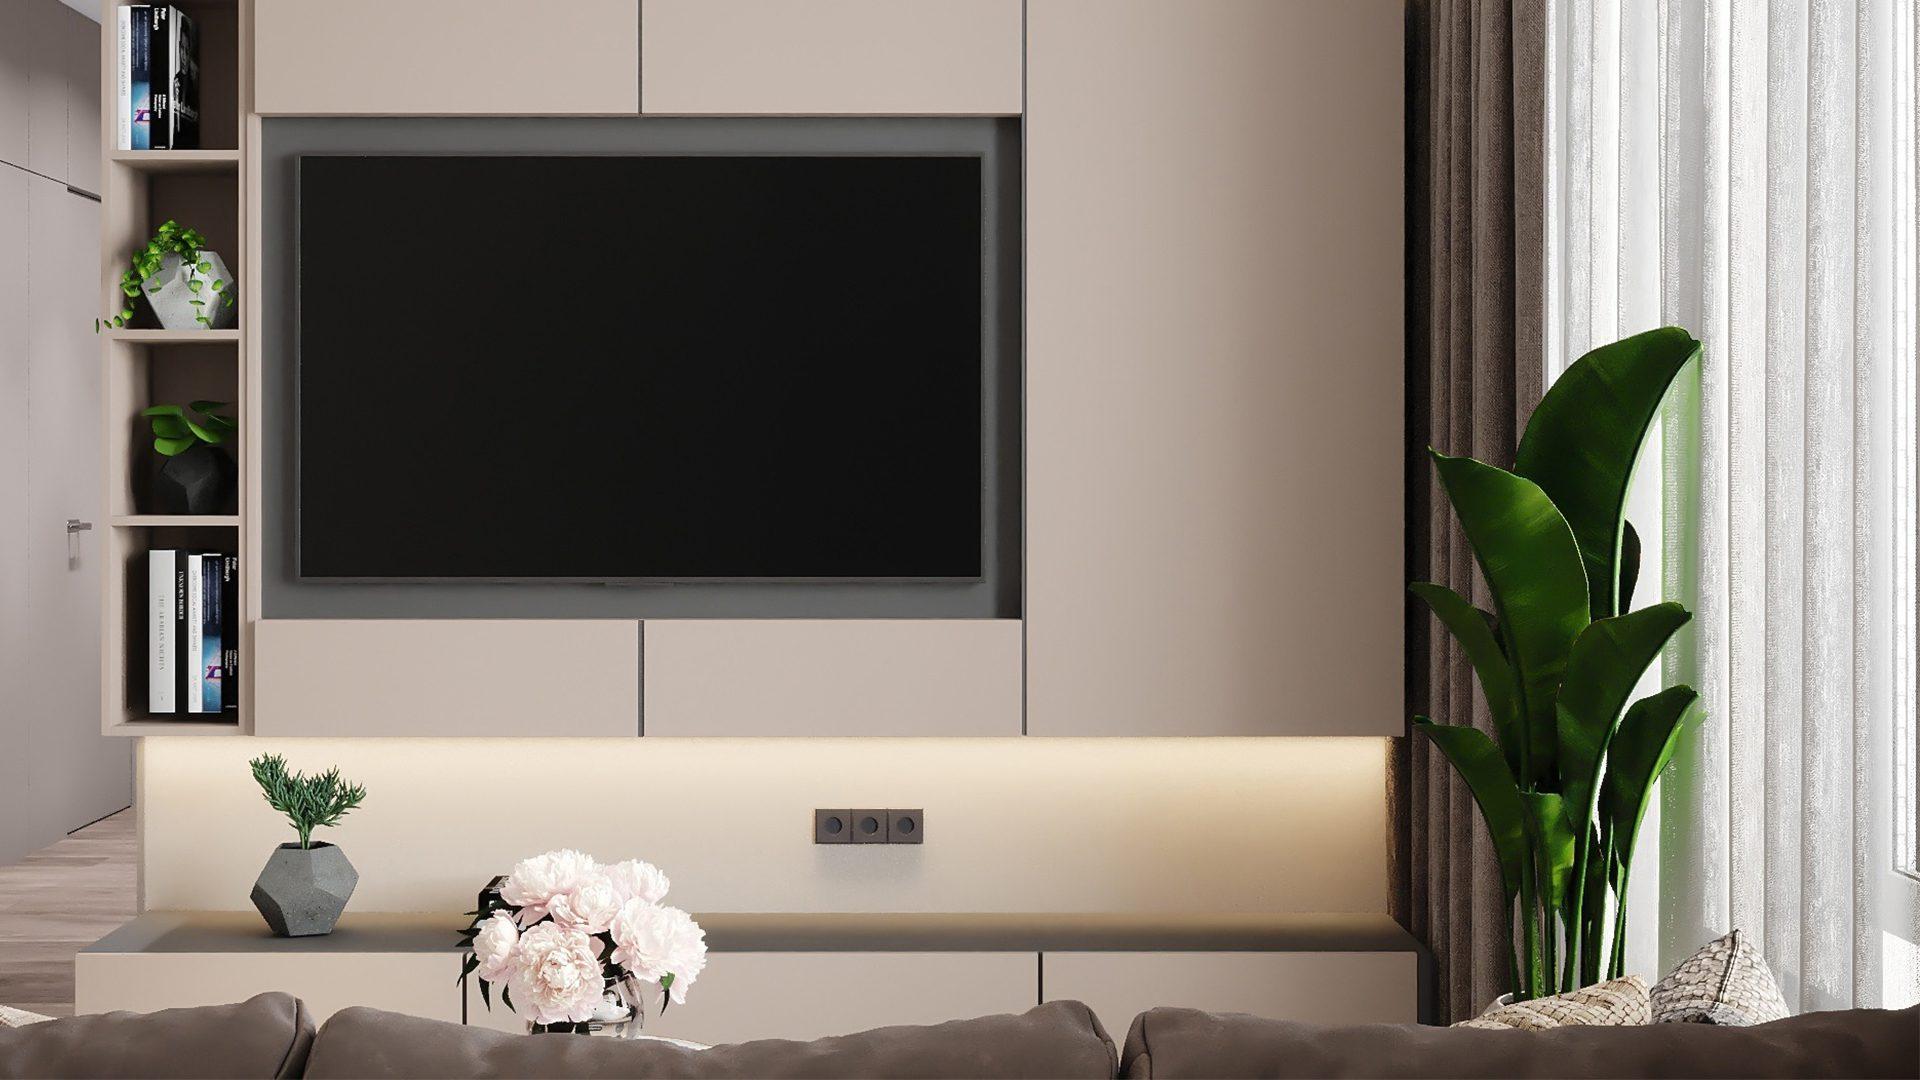 Granderu-Park-Residences-Bedroom-1_sample-interior-design1920x1080_Home-Quarters-SG_KC-Ng-Keng-Chong.jpg